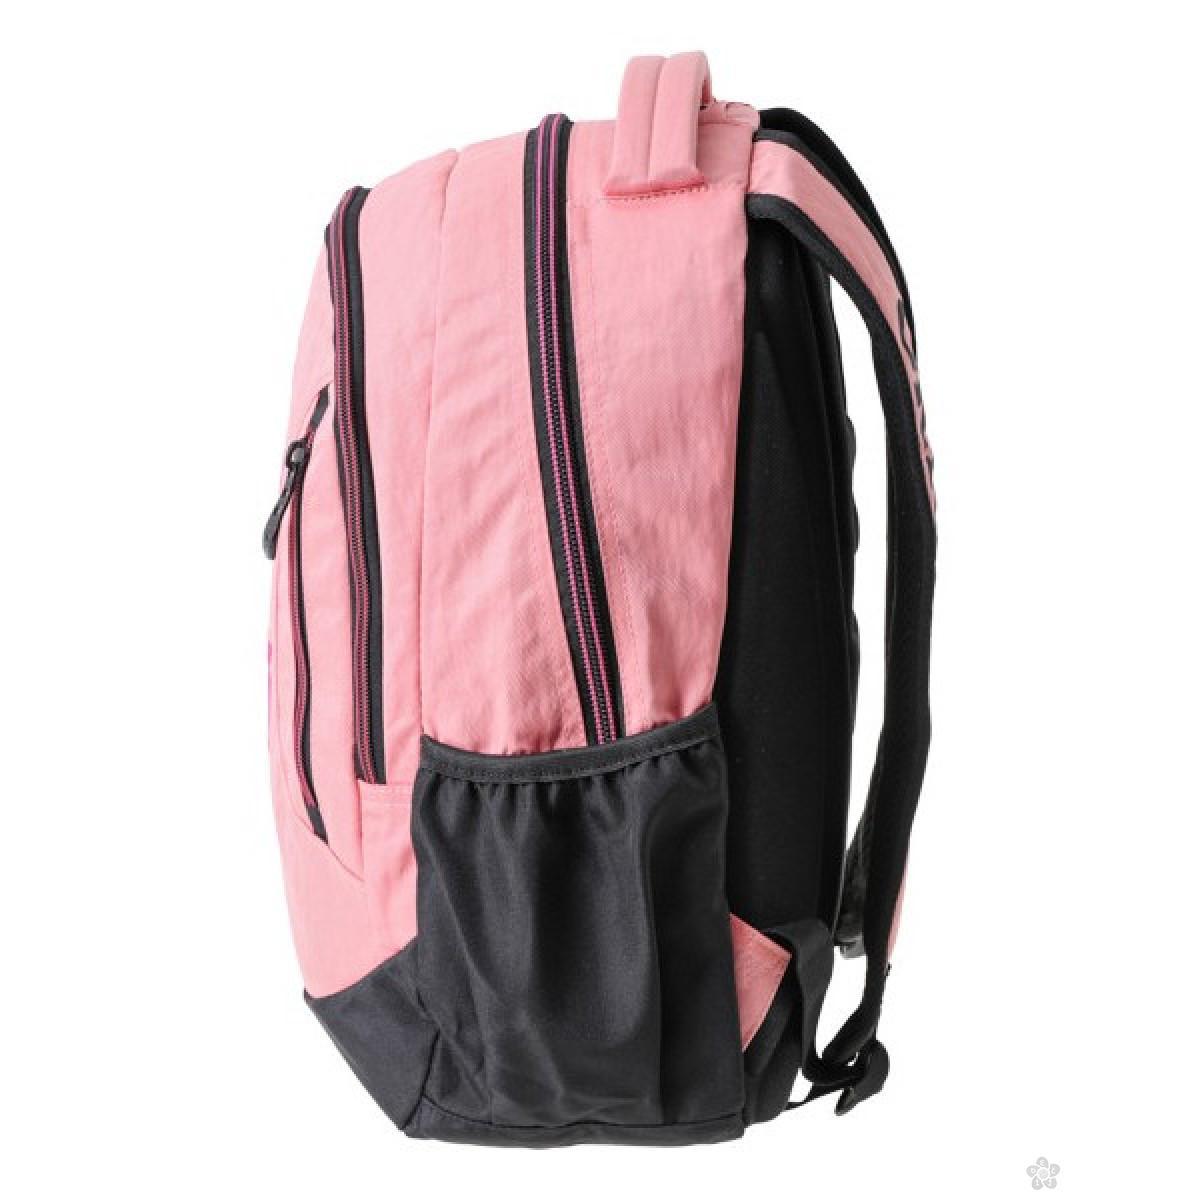 Ergonomski ranac Tera Pink 162041